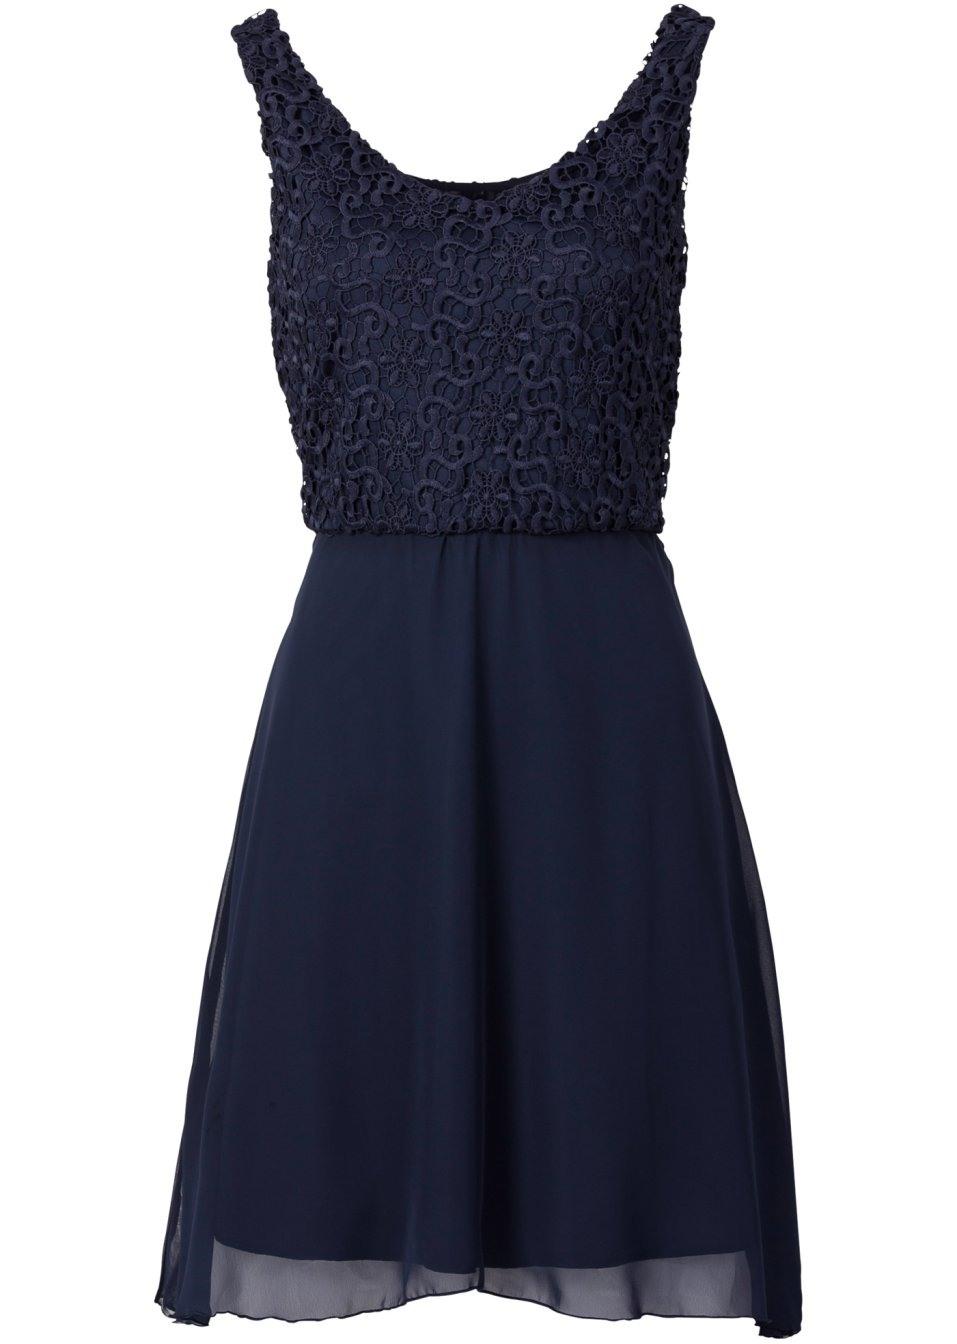 17 Genial Blaues Kleid Kurz DesignAbend Perfekt Blaues Kleid Kurz Ärmel